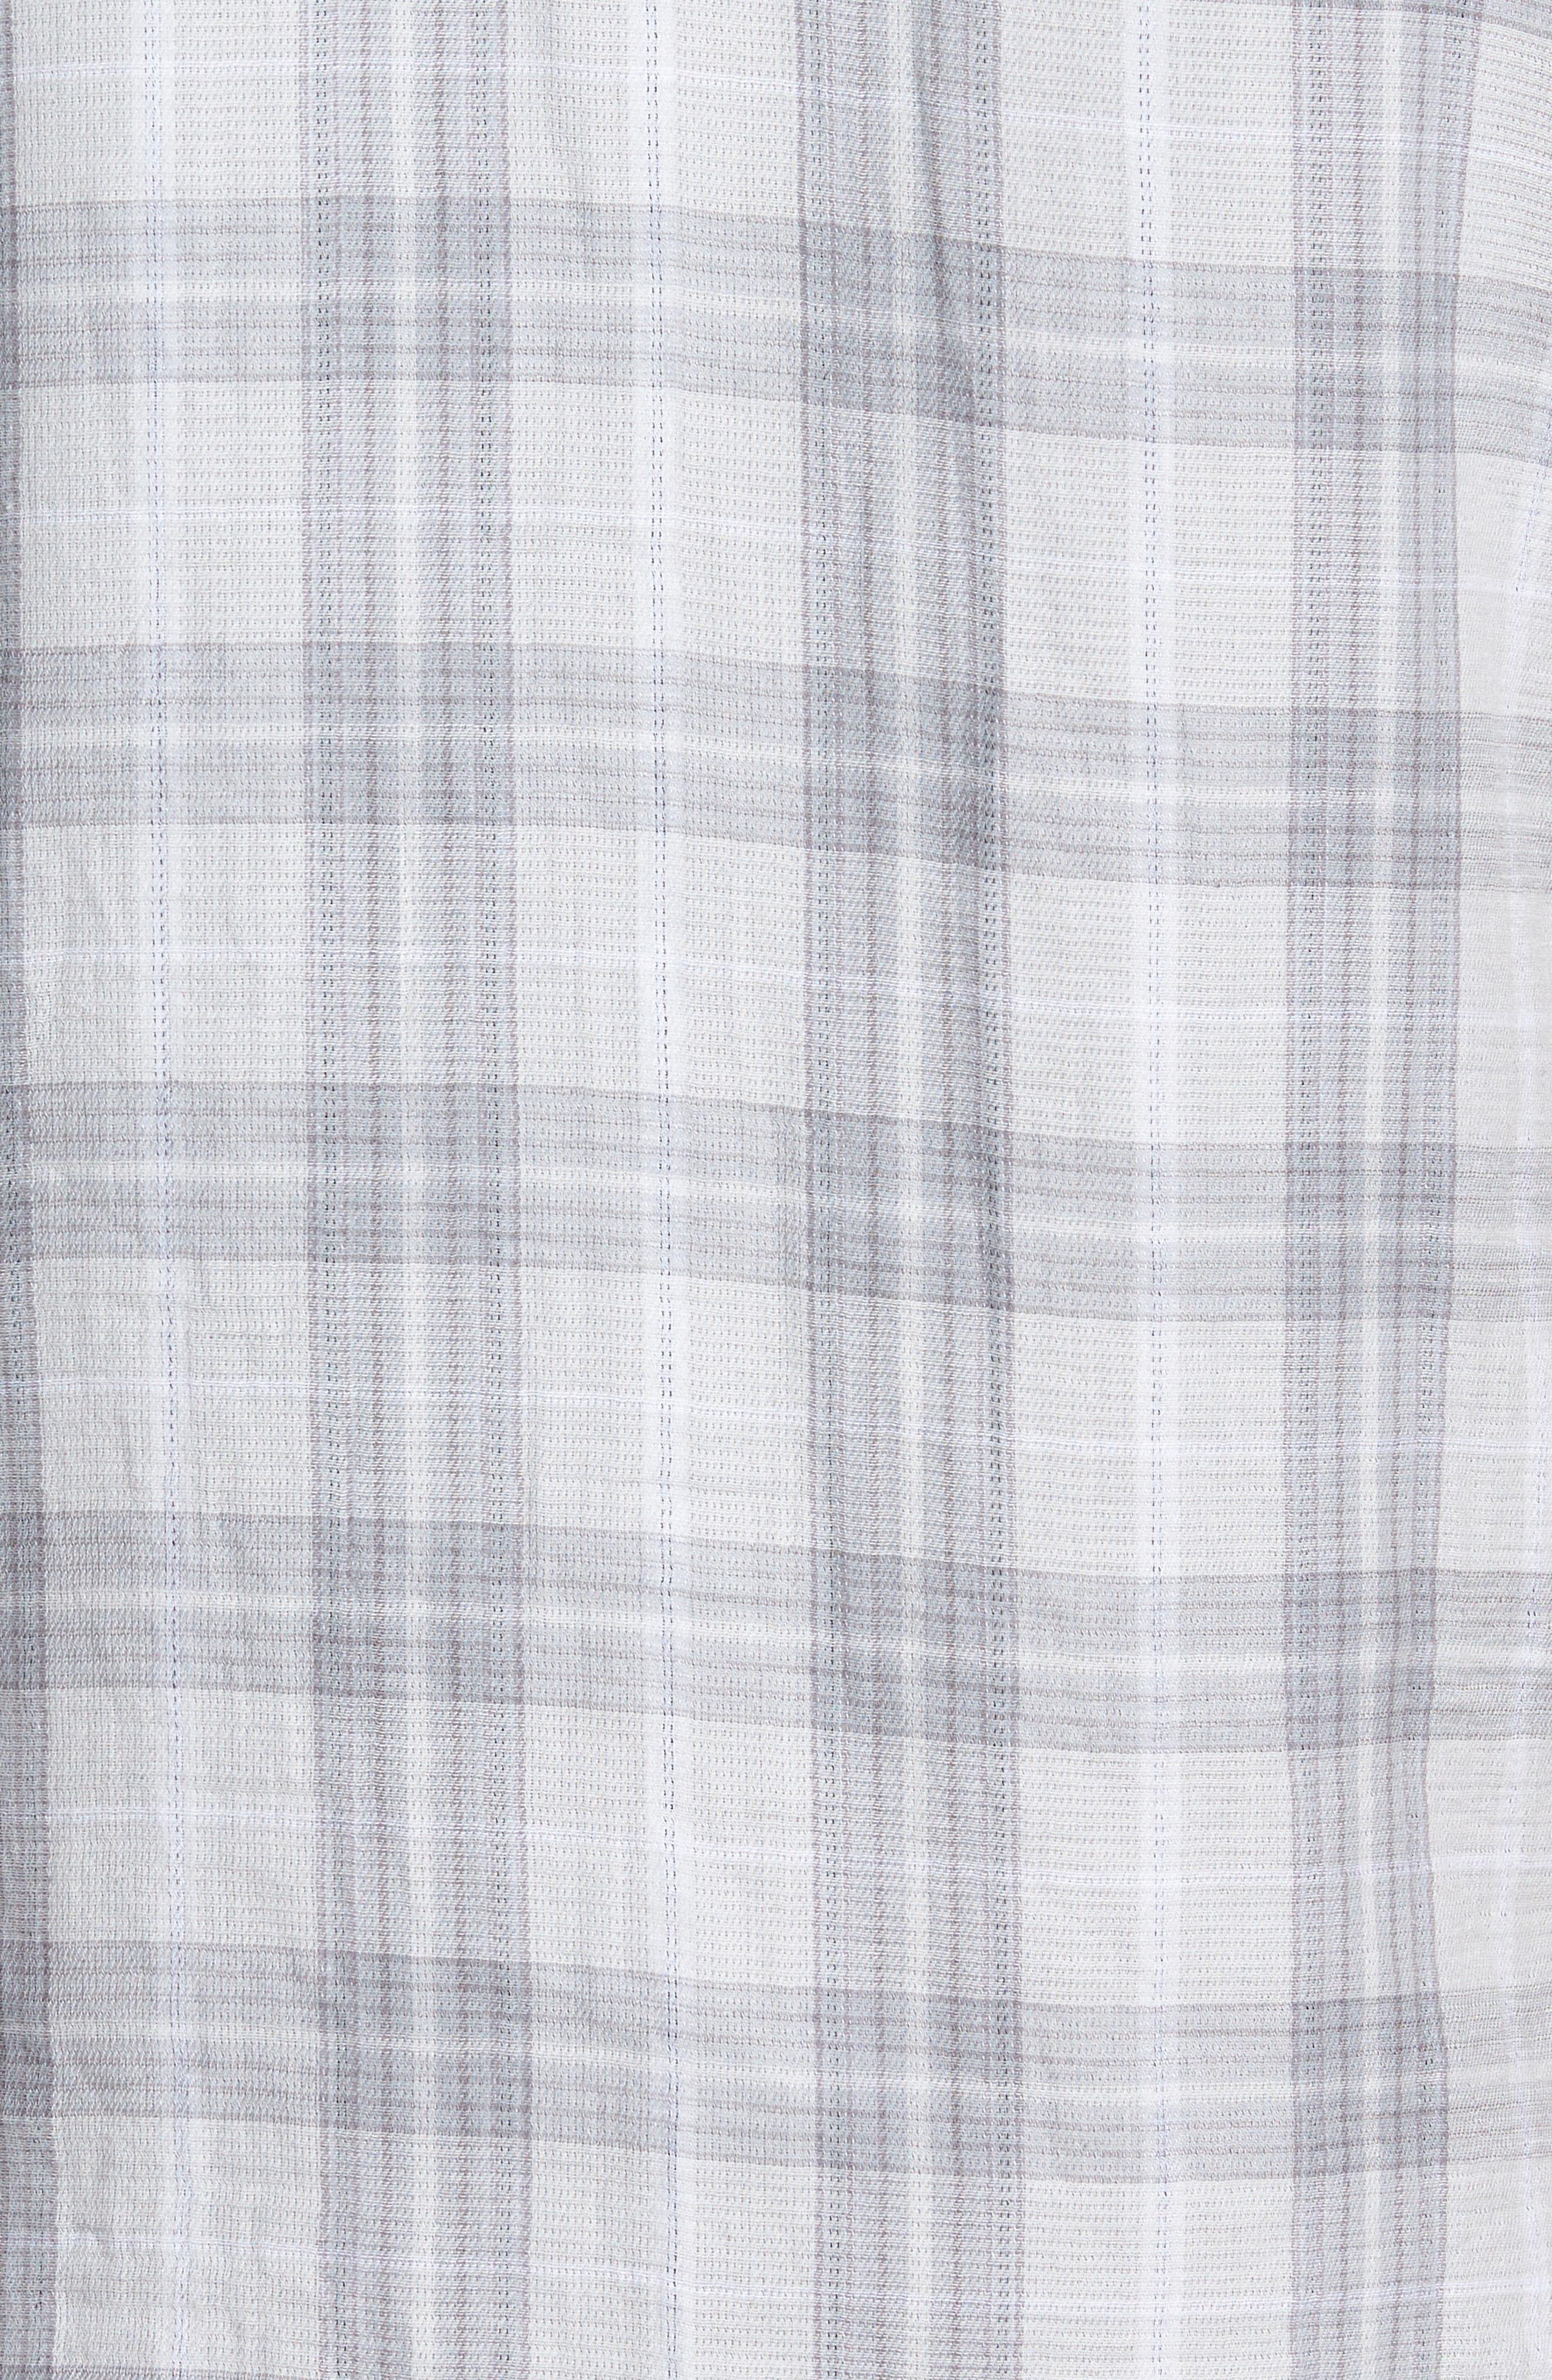 Plaid Short Sleeve Sport Shirt,                             Alternate thumbnail 4, color,                             Grey Sleet Plaid Duofold